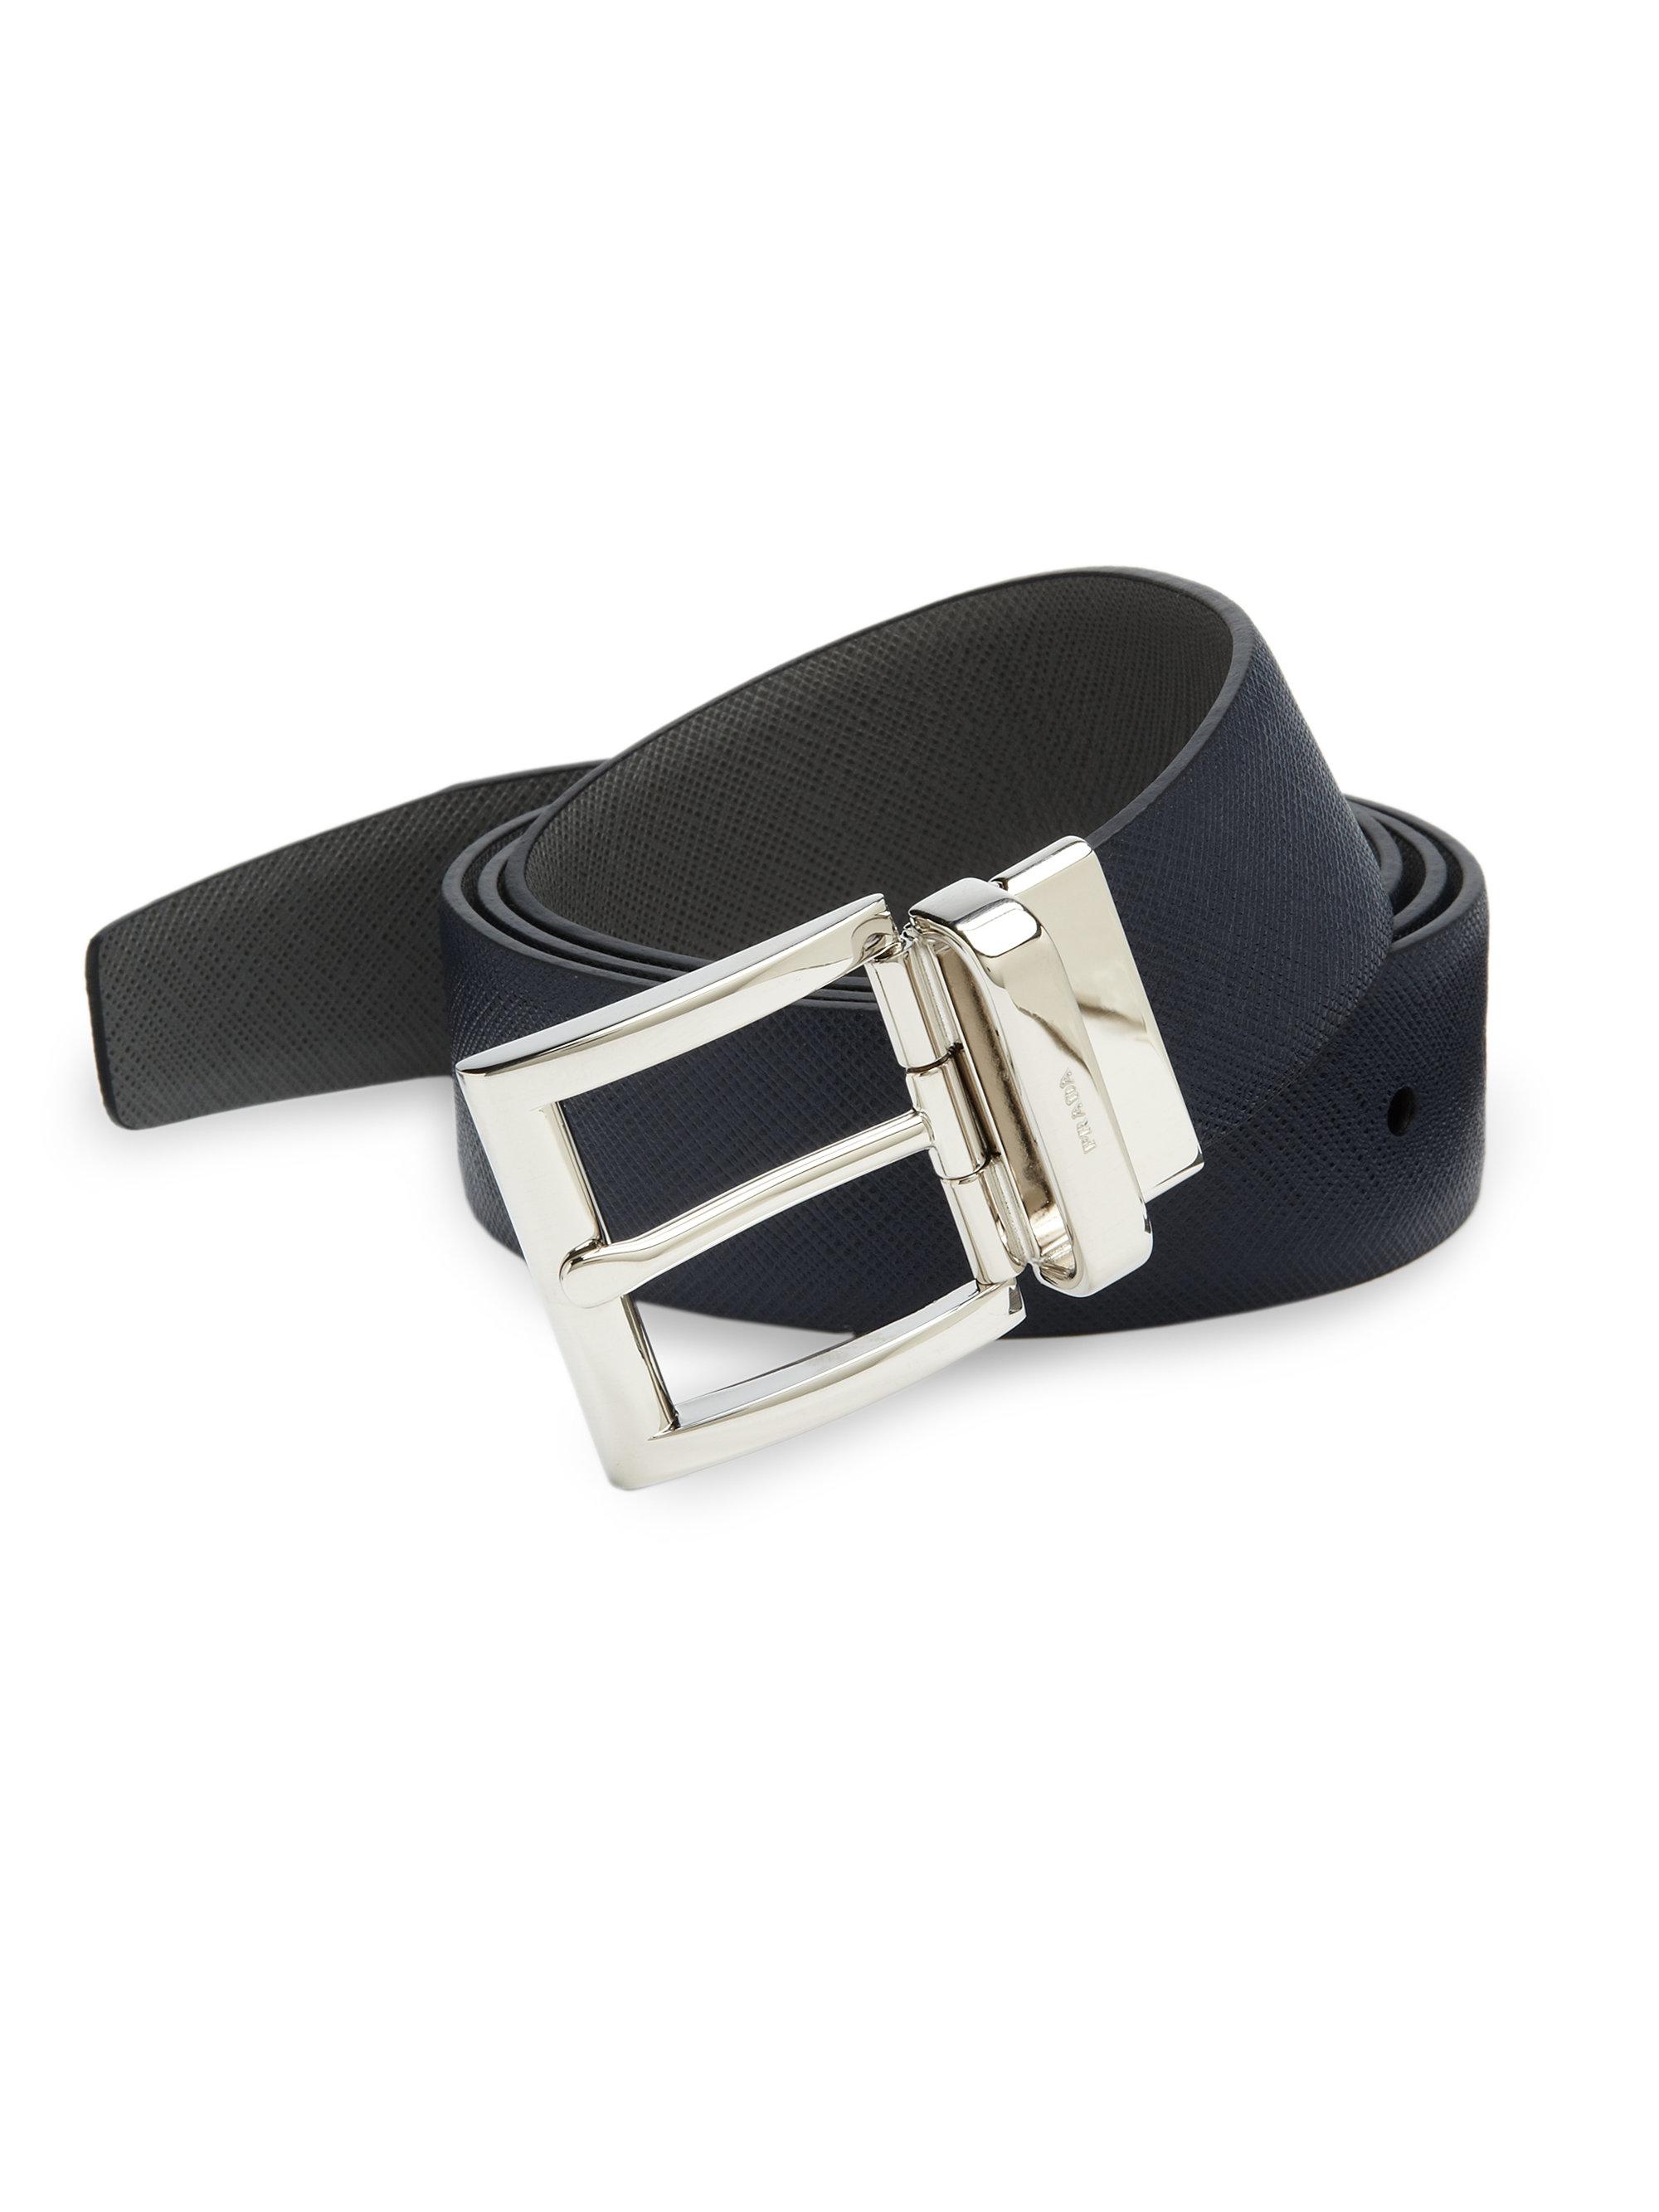 Prada Saffiano Reversible Belt In Black For Men